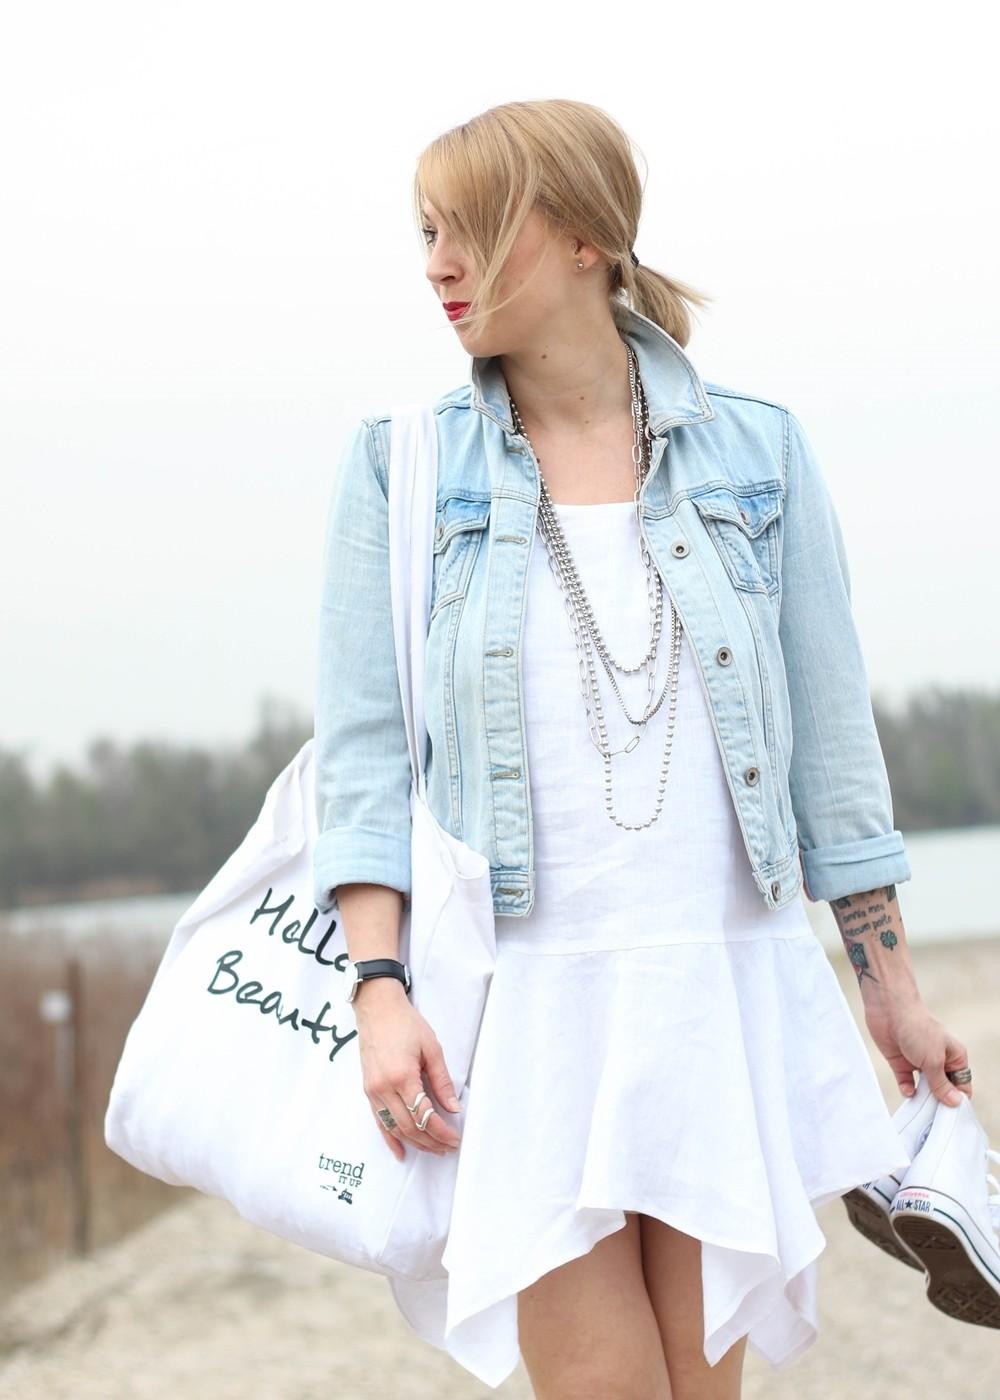 Fashionblogger Karlsruhe Outfit Strand weisses Kleid Jeansjacke Lederchucks (5)